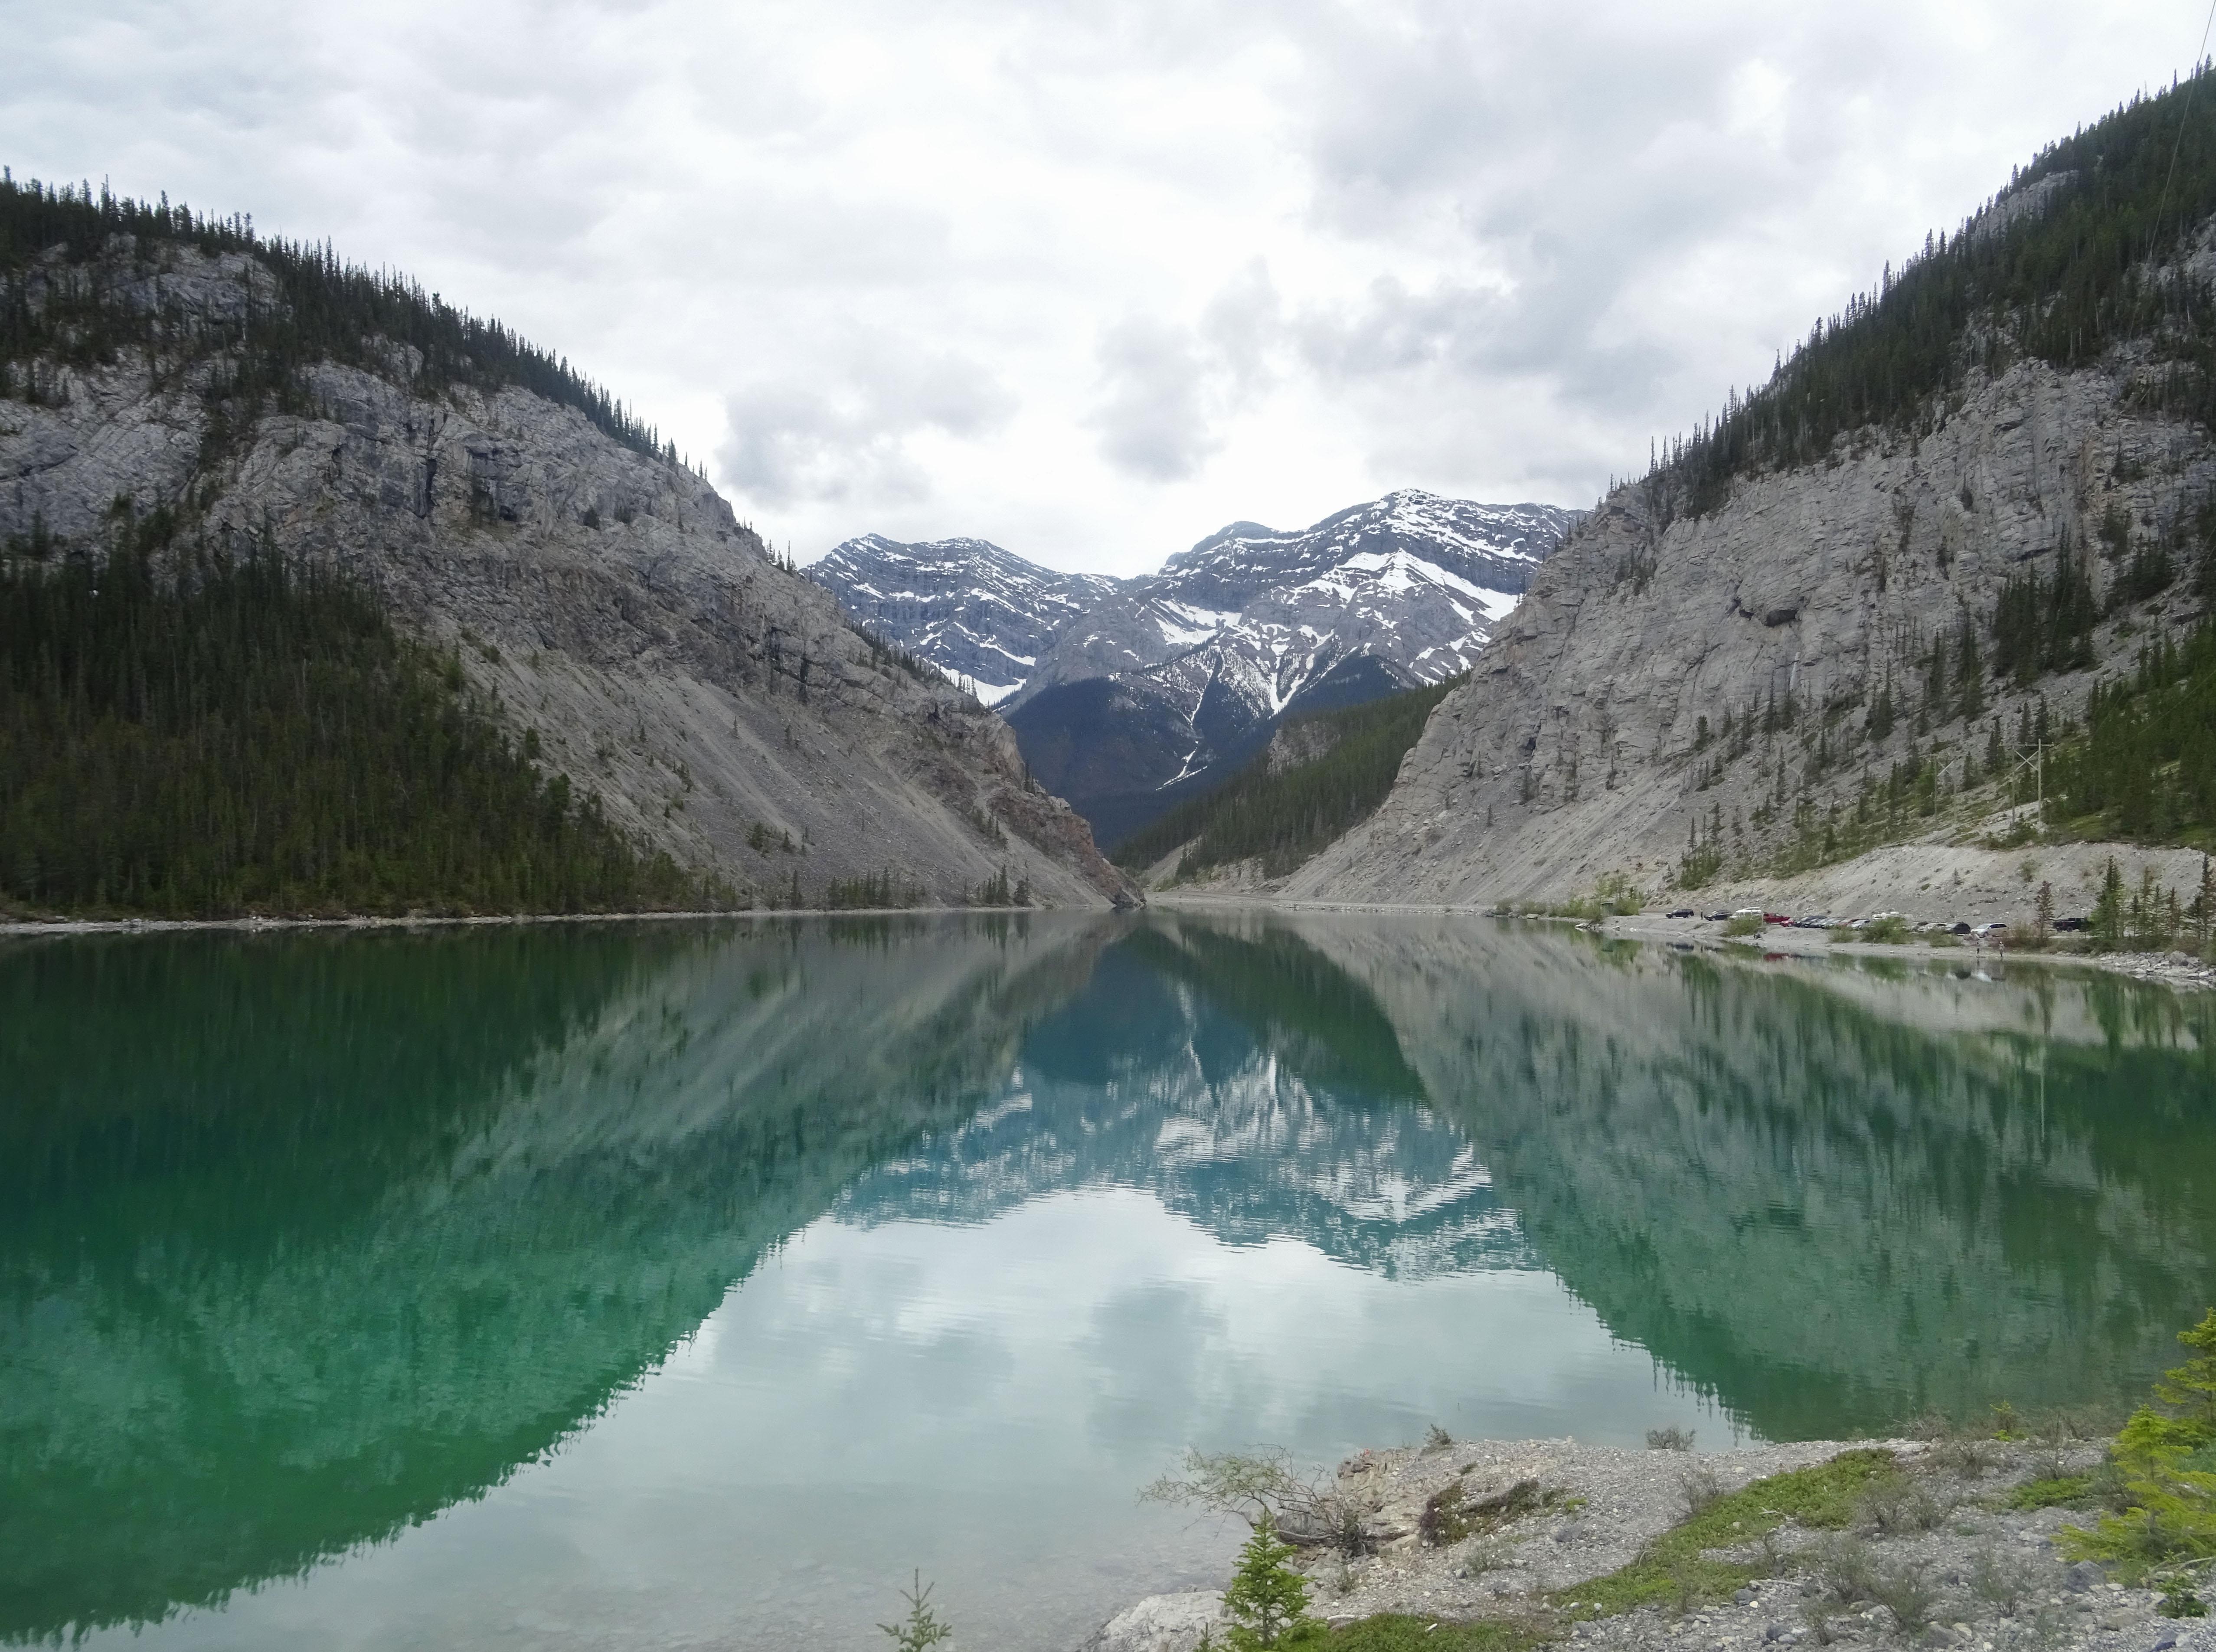 Randonnée à Canmore, Alberta, Canada